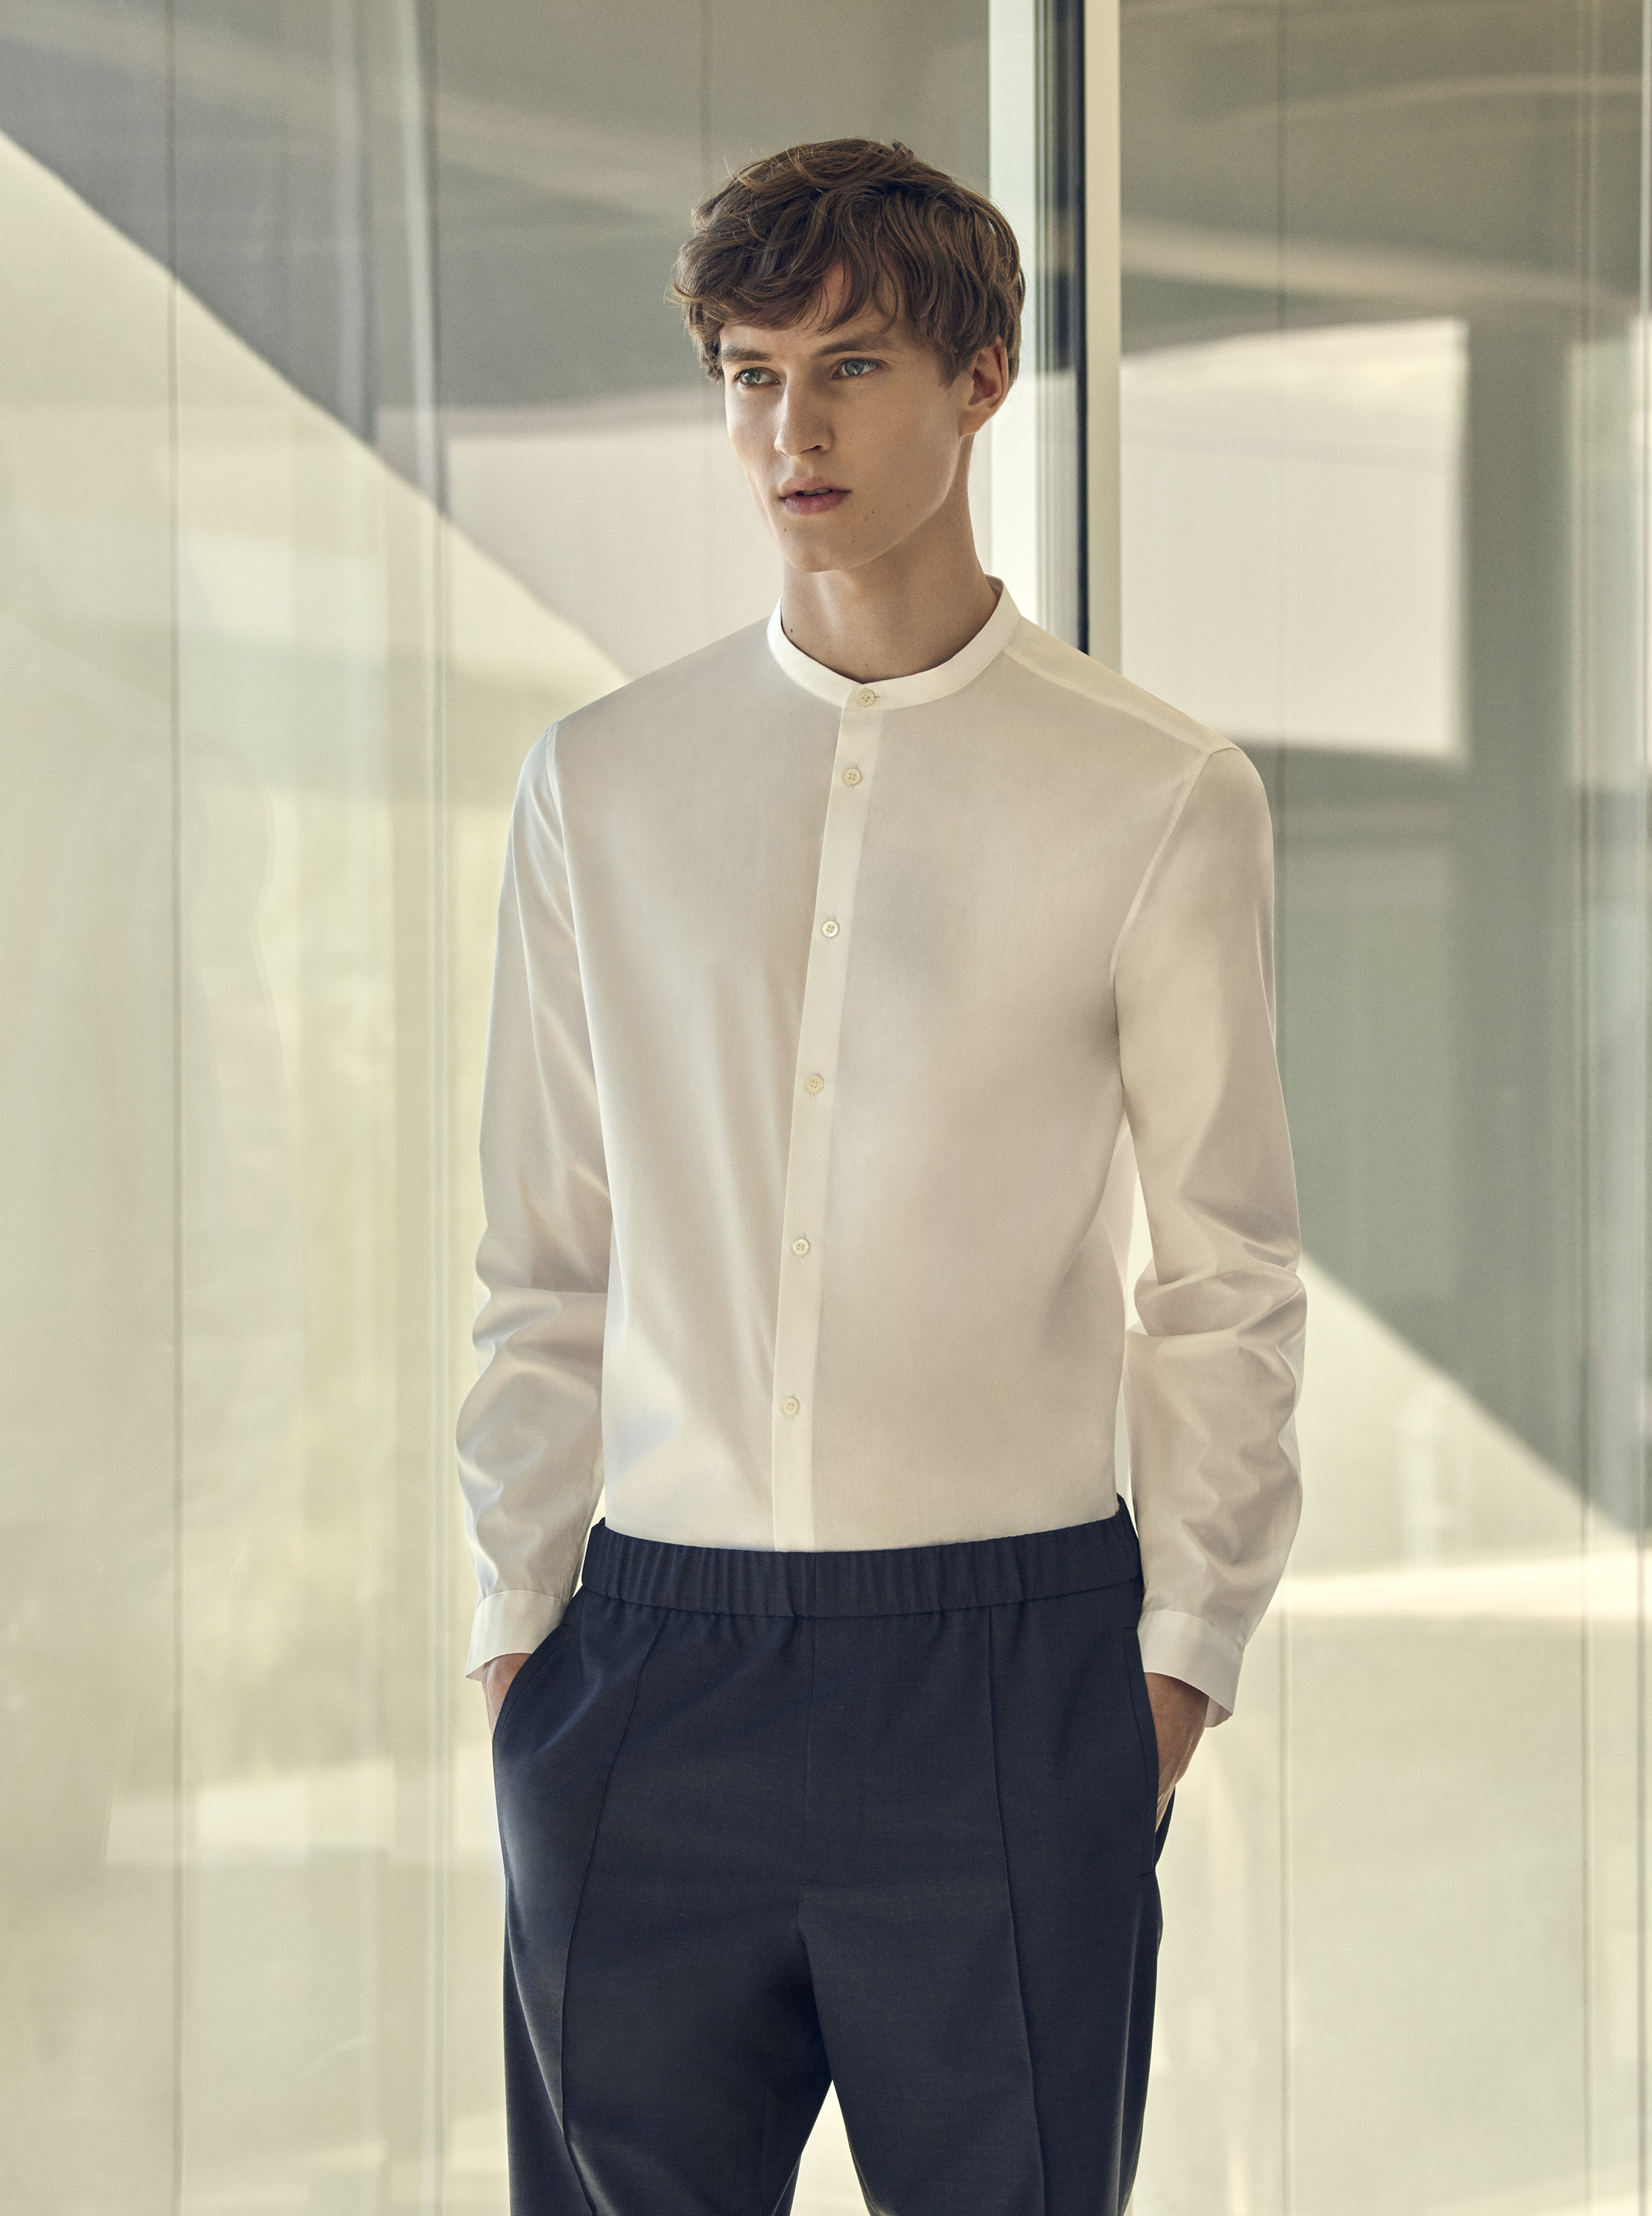 Narrow granddad collar shirt (59€) + Elasticated waist trousers (79€)